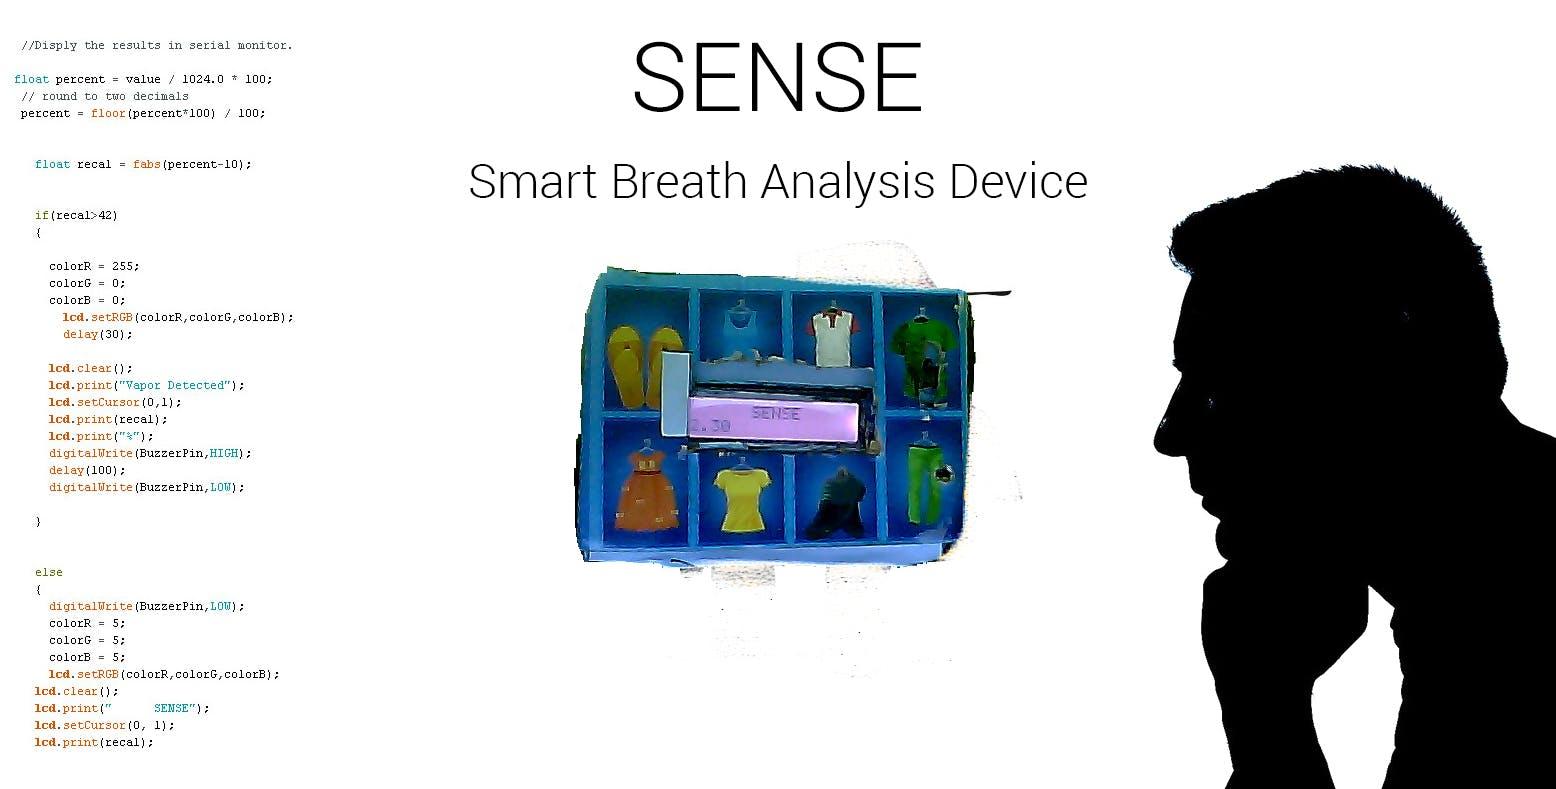 SENSE : Smart Breath Analysis Device (A Smart Breathalyzer)